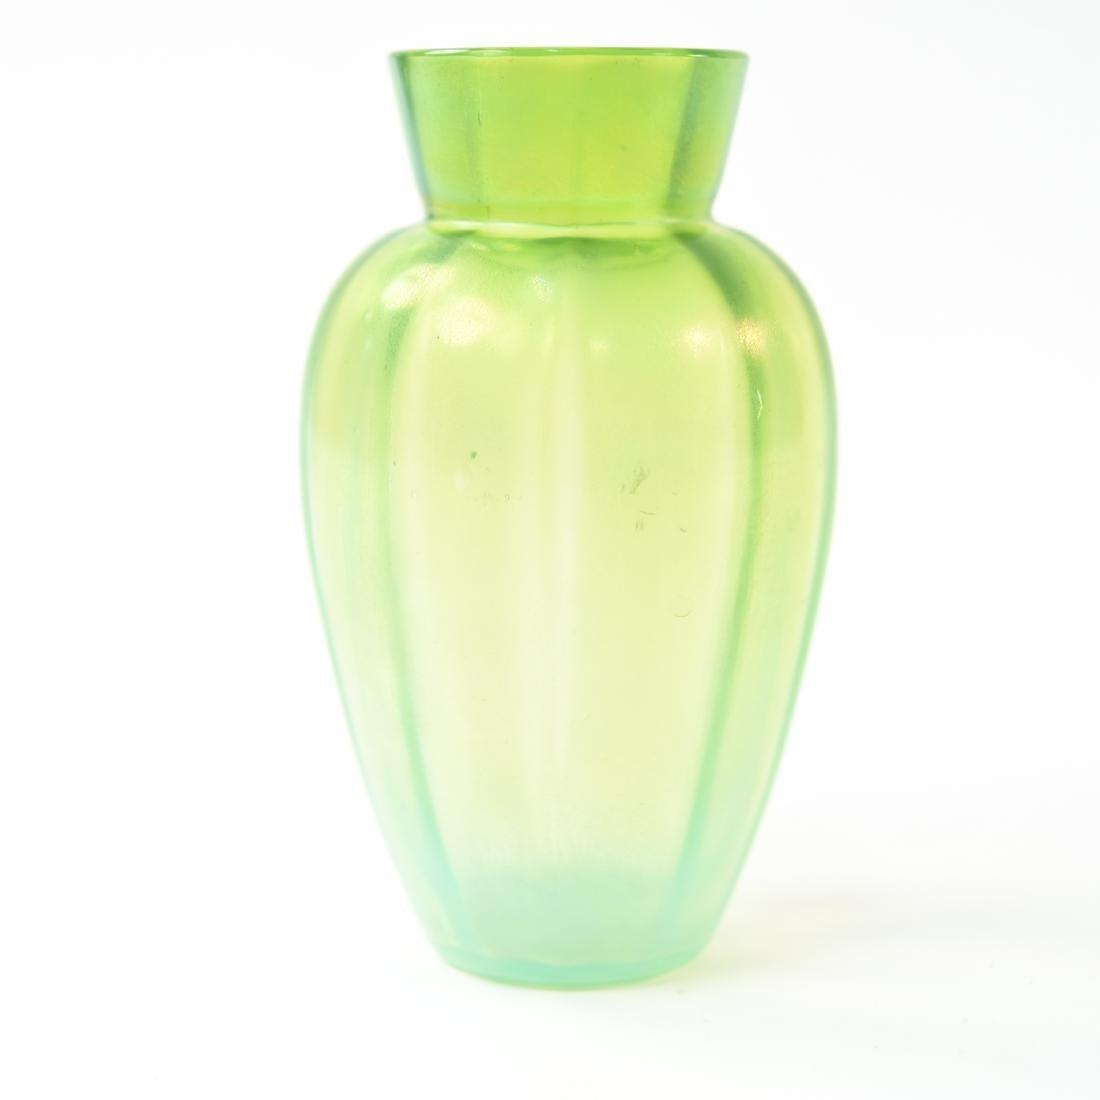 IRIDESCENT ART GLASS VASE